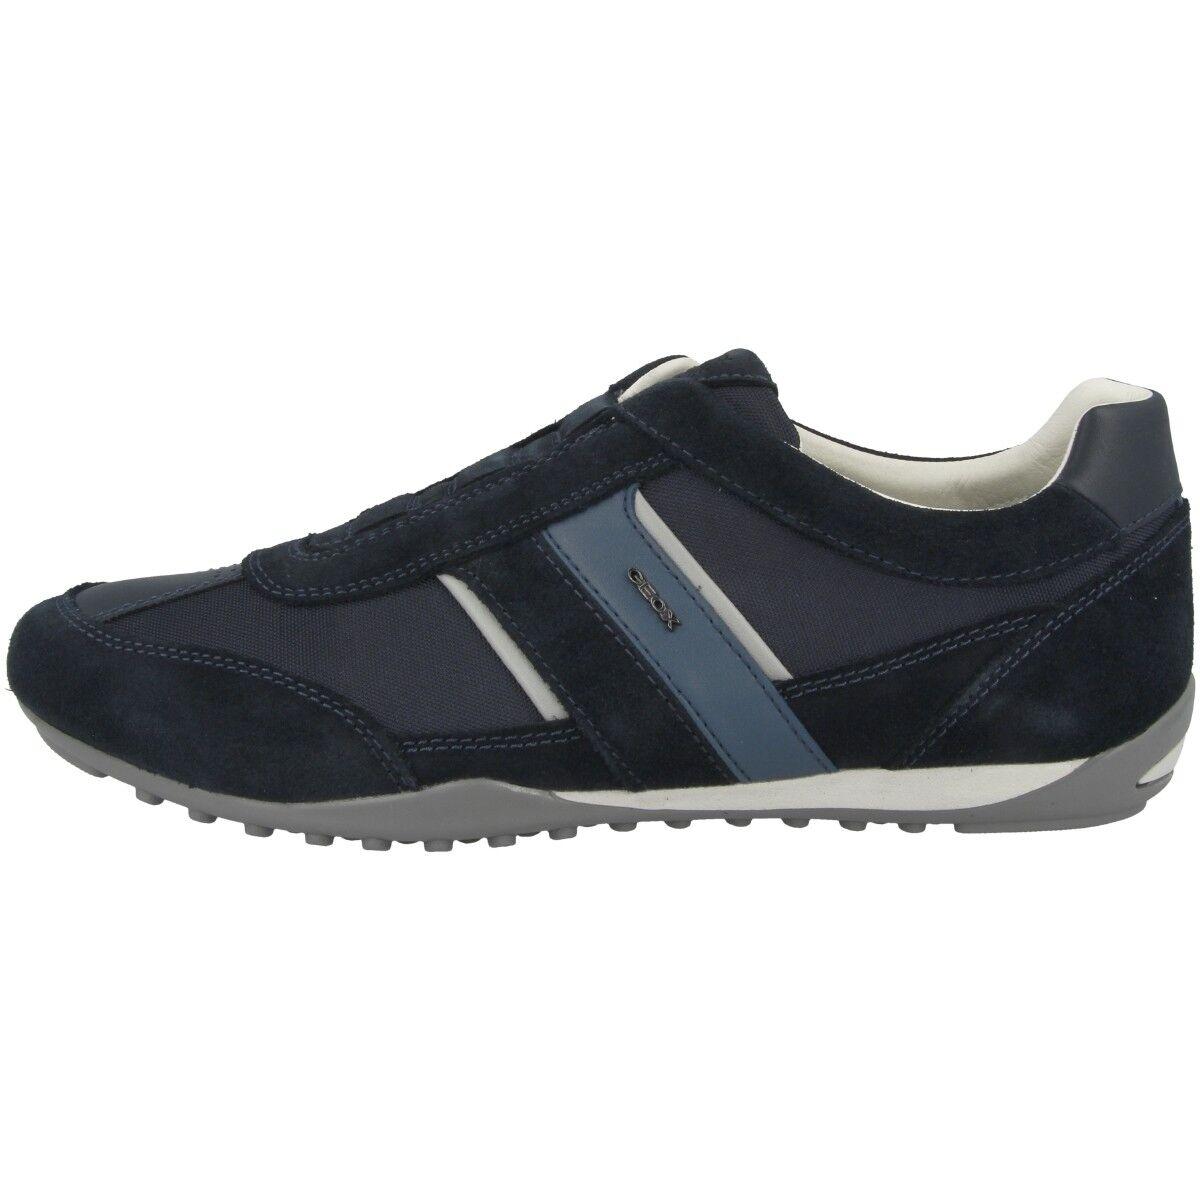 Geox u Wells a shoes Men Men's Leisure Trainers Low shoes U82T5A02211C4002